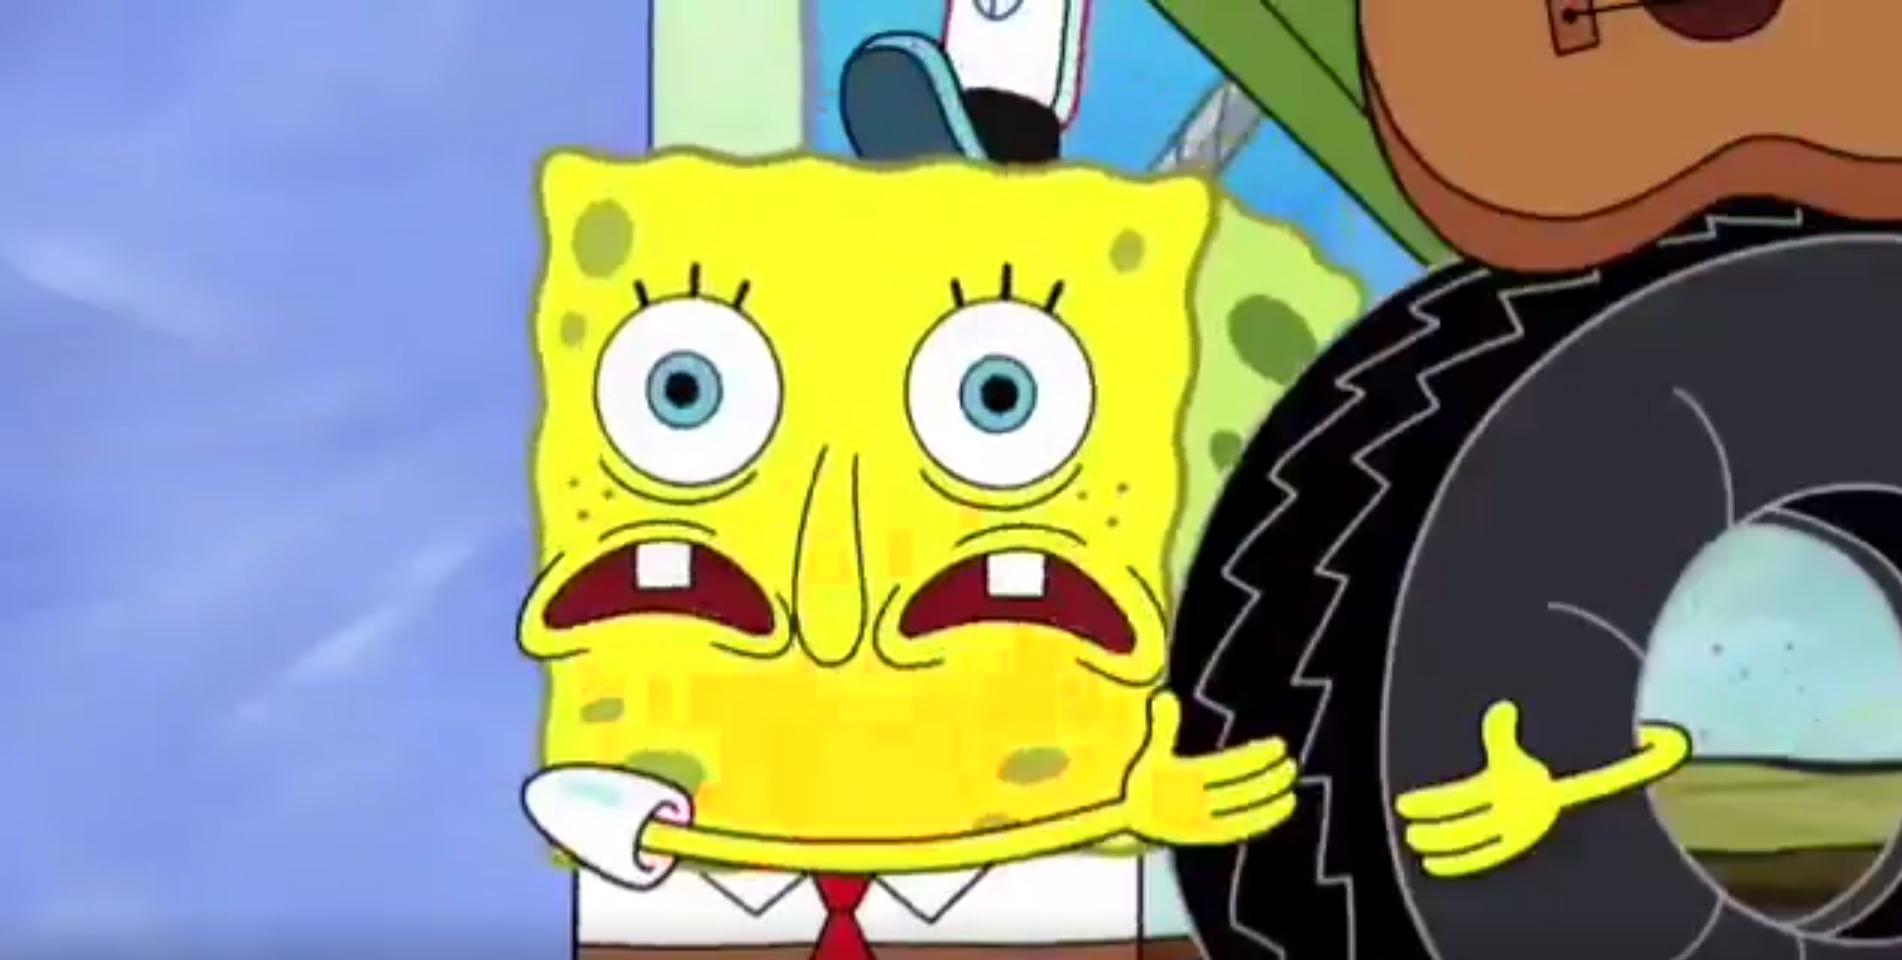 High quality spongebob uh oh blank meme template